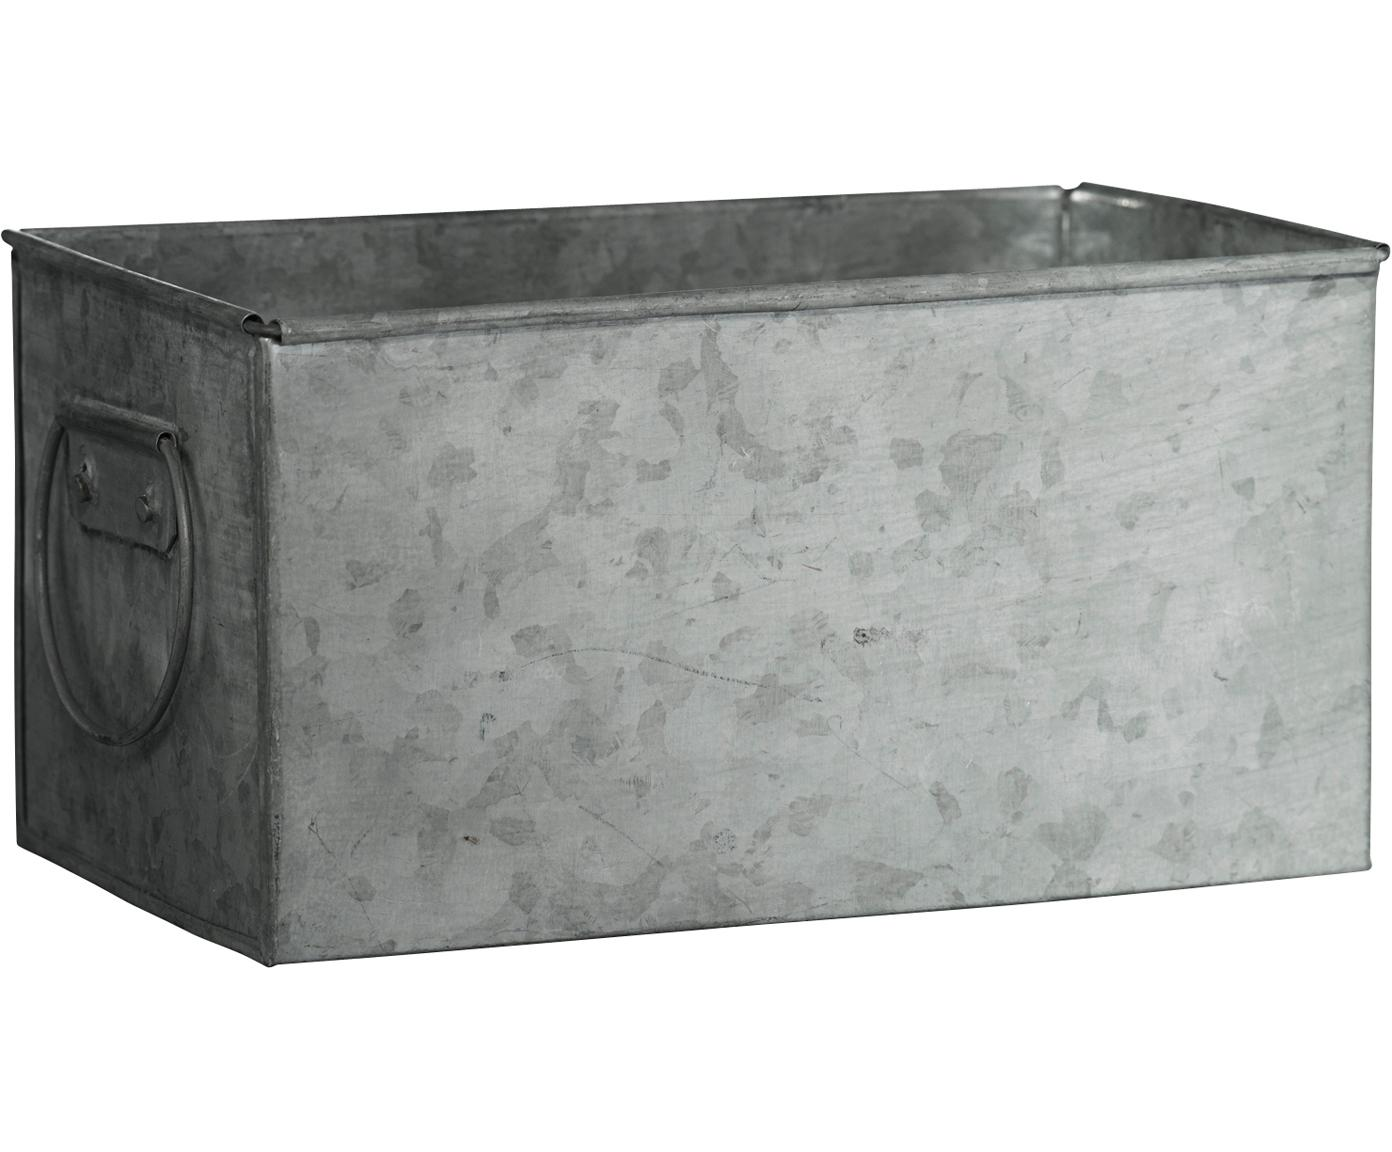 Macetero Zintly, Metal, galvanizado, Zinc, An 17 x Al 9 cm